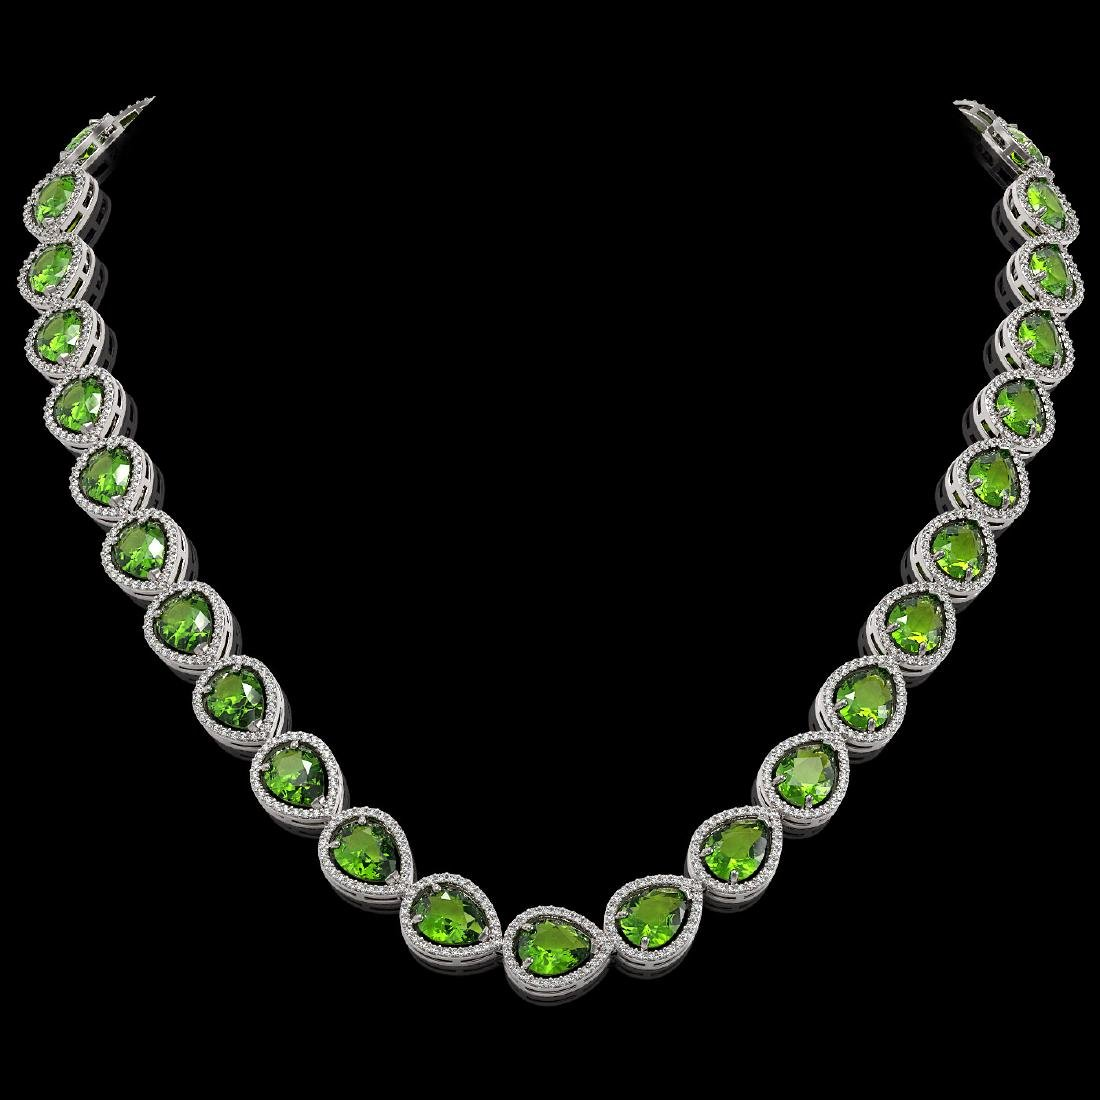 33.6 CTW Peridot & Diamond Halo Necklace 10K White Gold